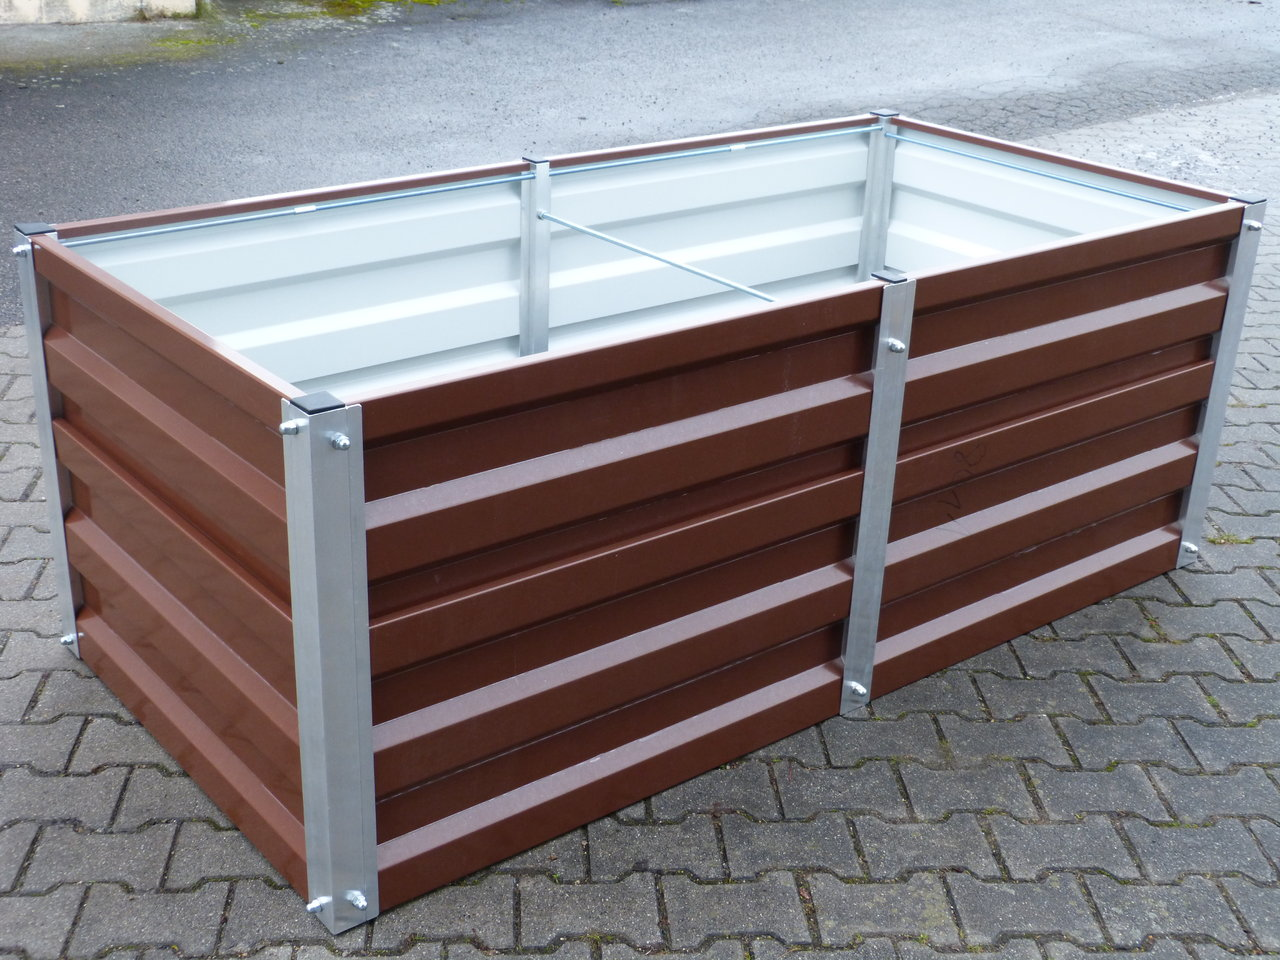 hochbeet metall gr 1 mtr breit x 2 mtr lang 85cm hoch willkommen bei hochbeete kaiser online. Black Bedroom Furniture Sets. Home Design Ideas